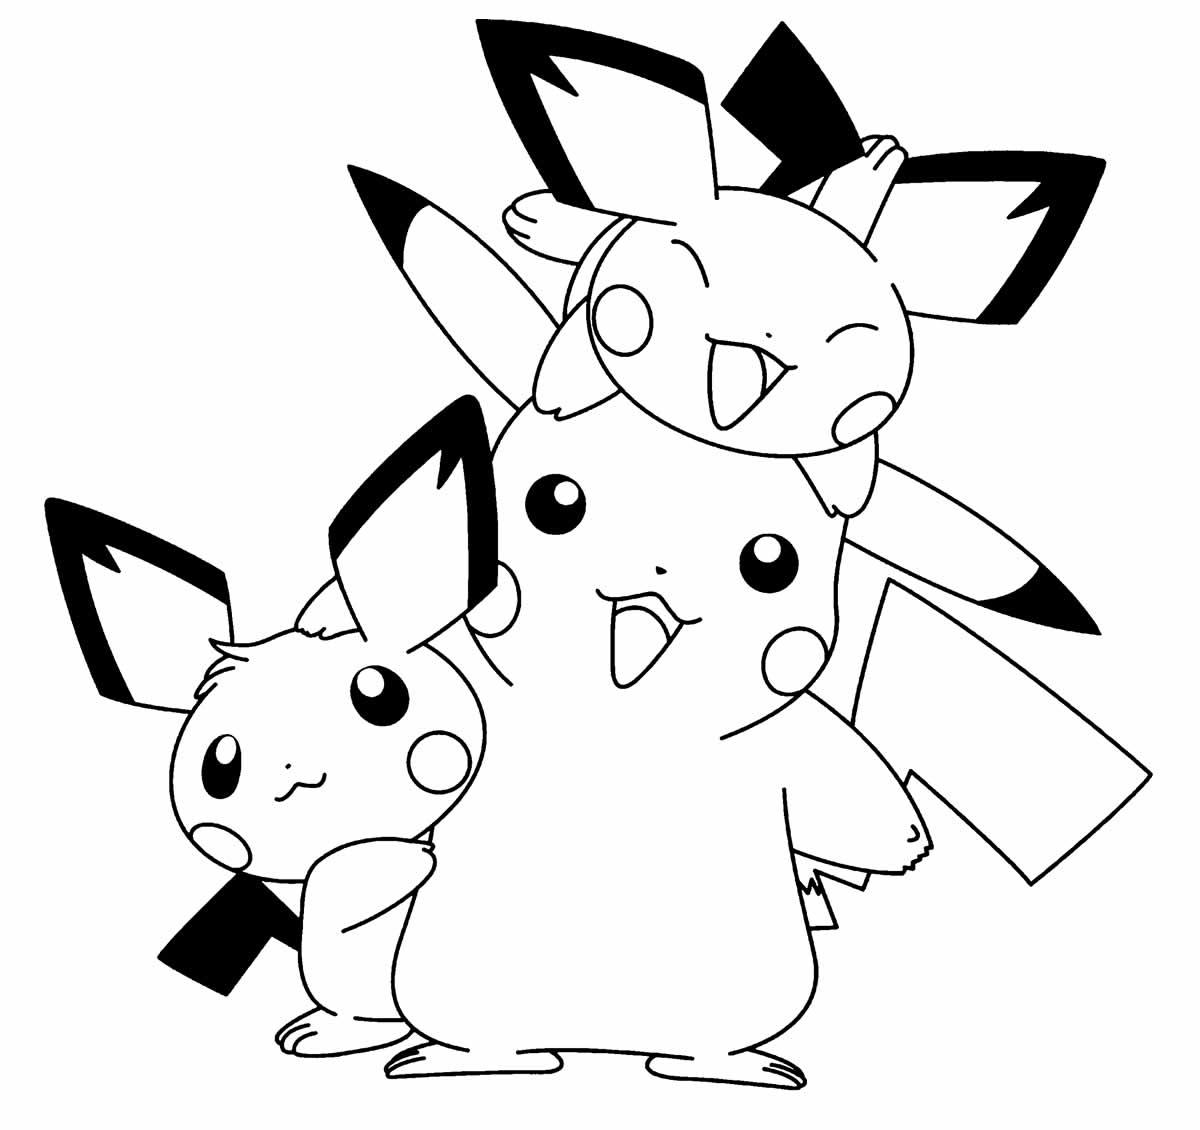 Molde de Pikachu para pintar